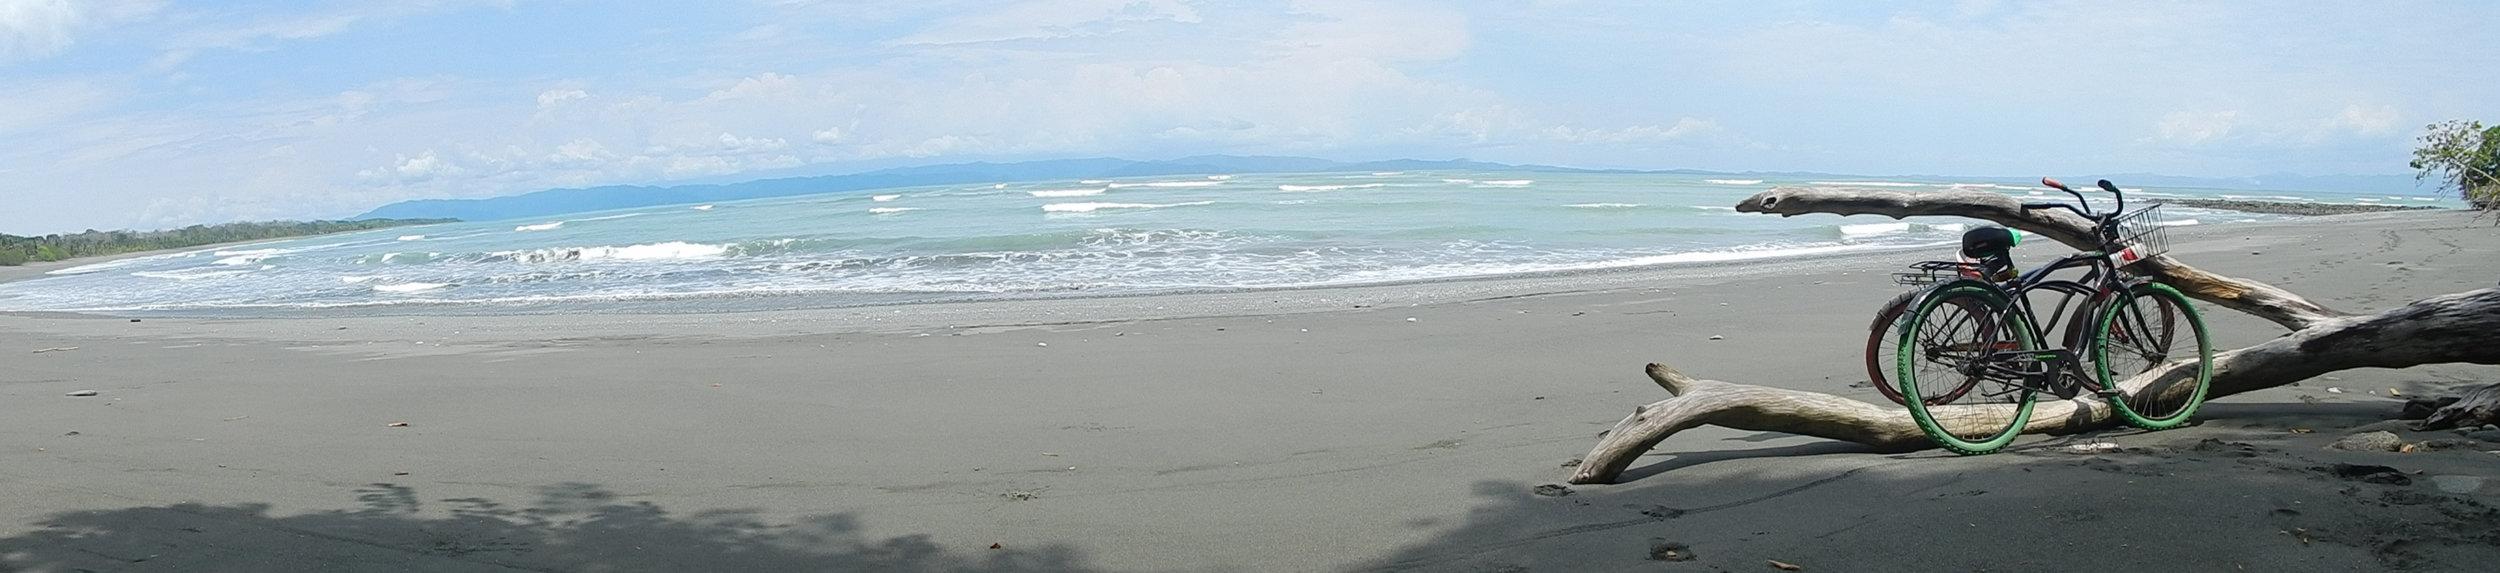 Cienega Beach photo by Paige Bentley